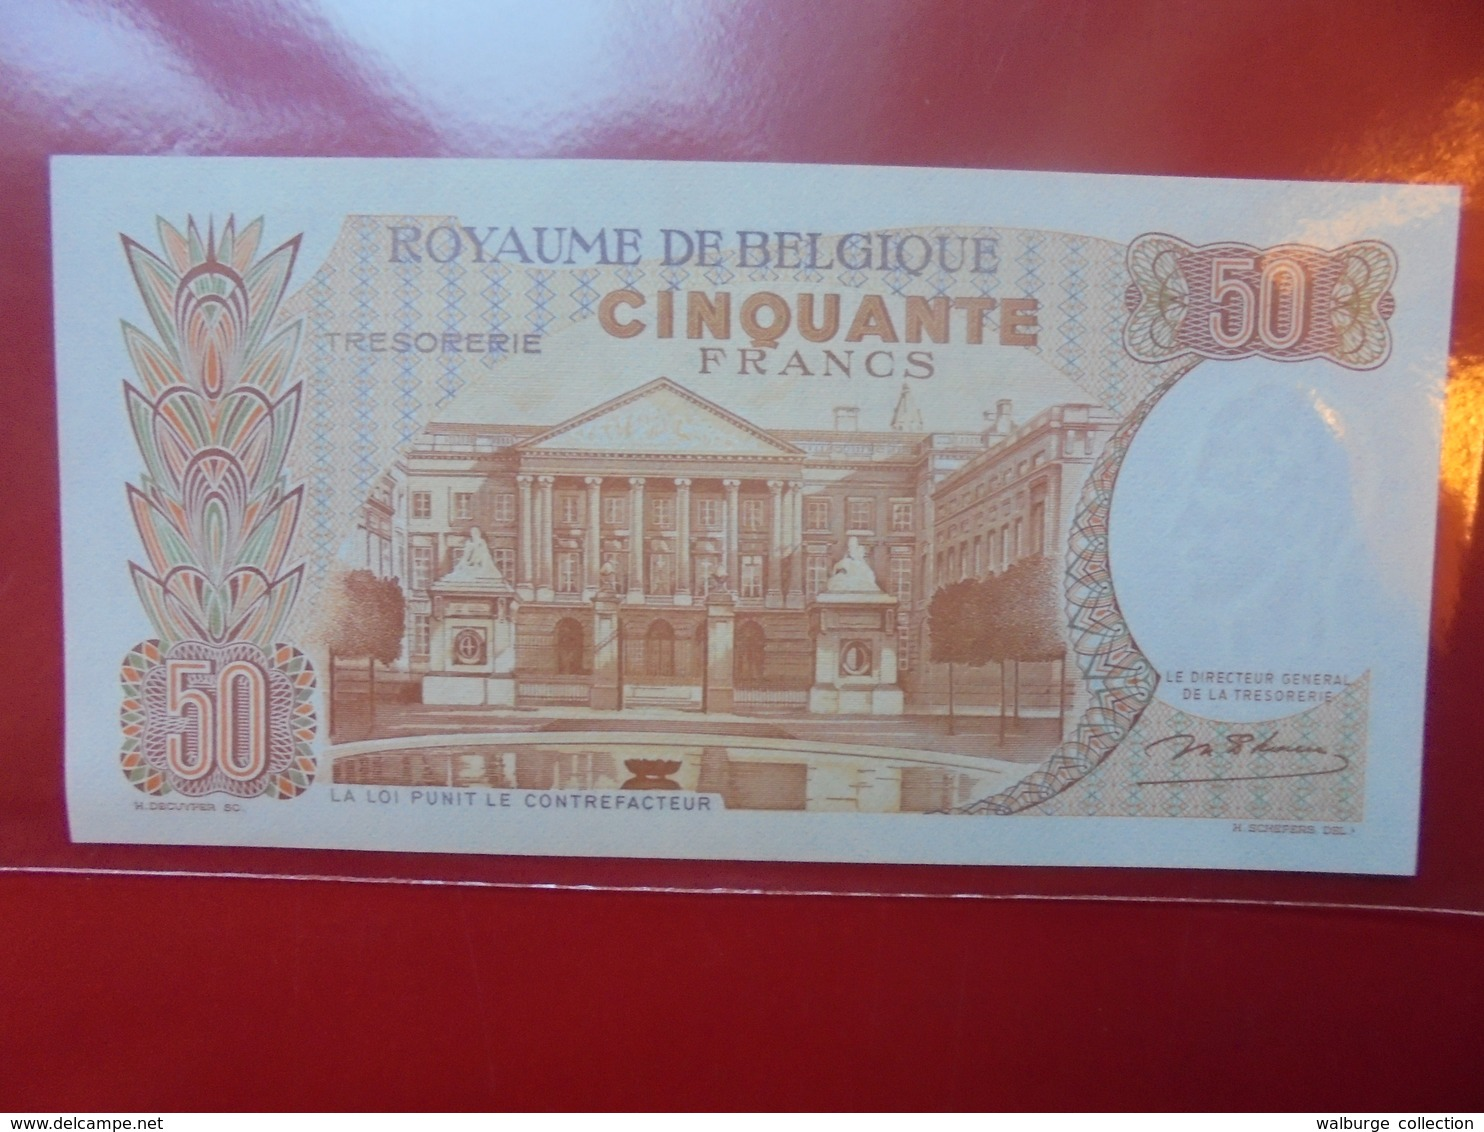 BELGIQUE 50 FRANCS 1966 CIRCULER TRES BELLE QUALITE ! - 50 Francs